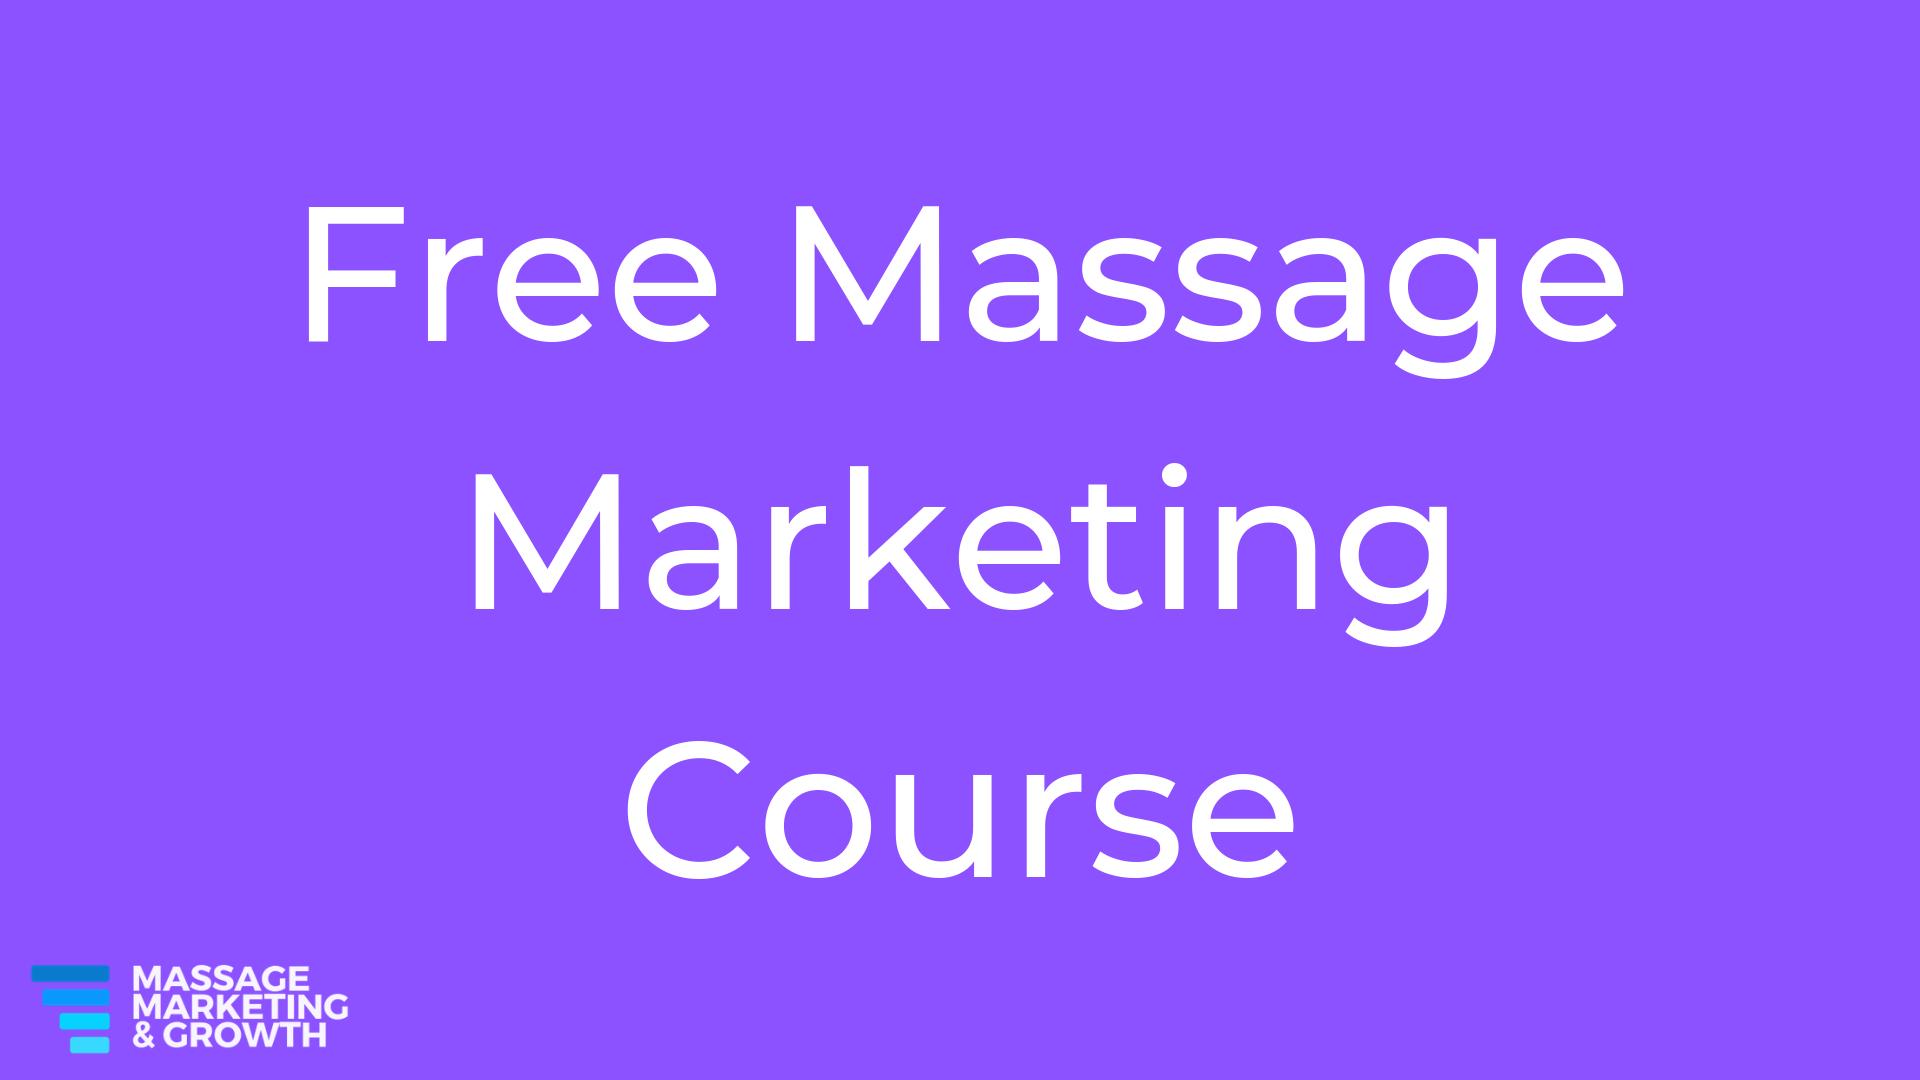 Free Massage Marketing Course